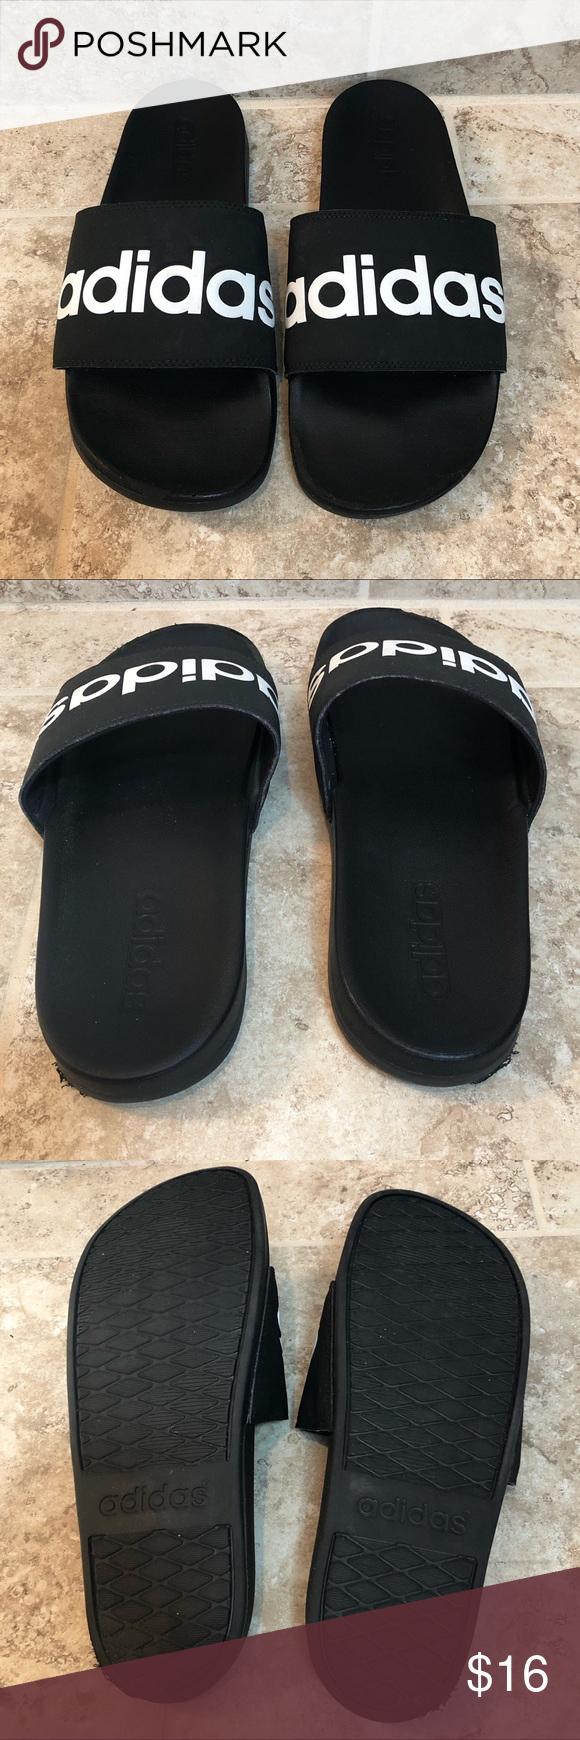 Adidas Slides Size 9 Attributes: Men's size 9 Adidas